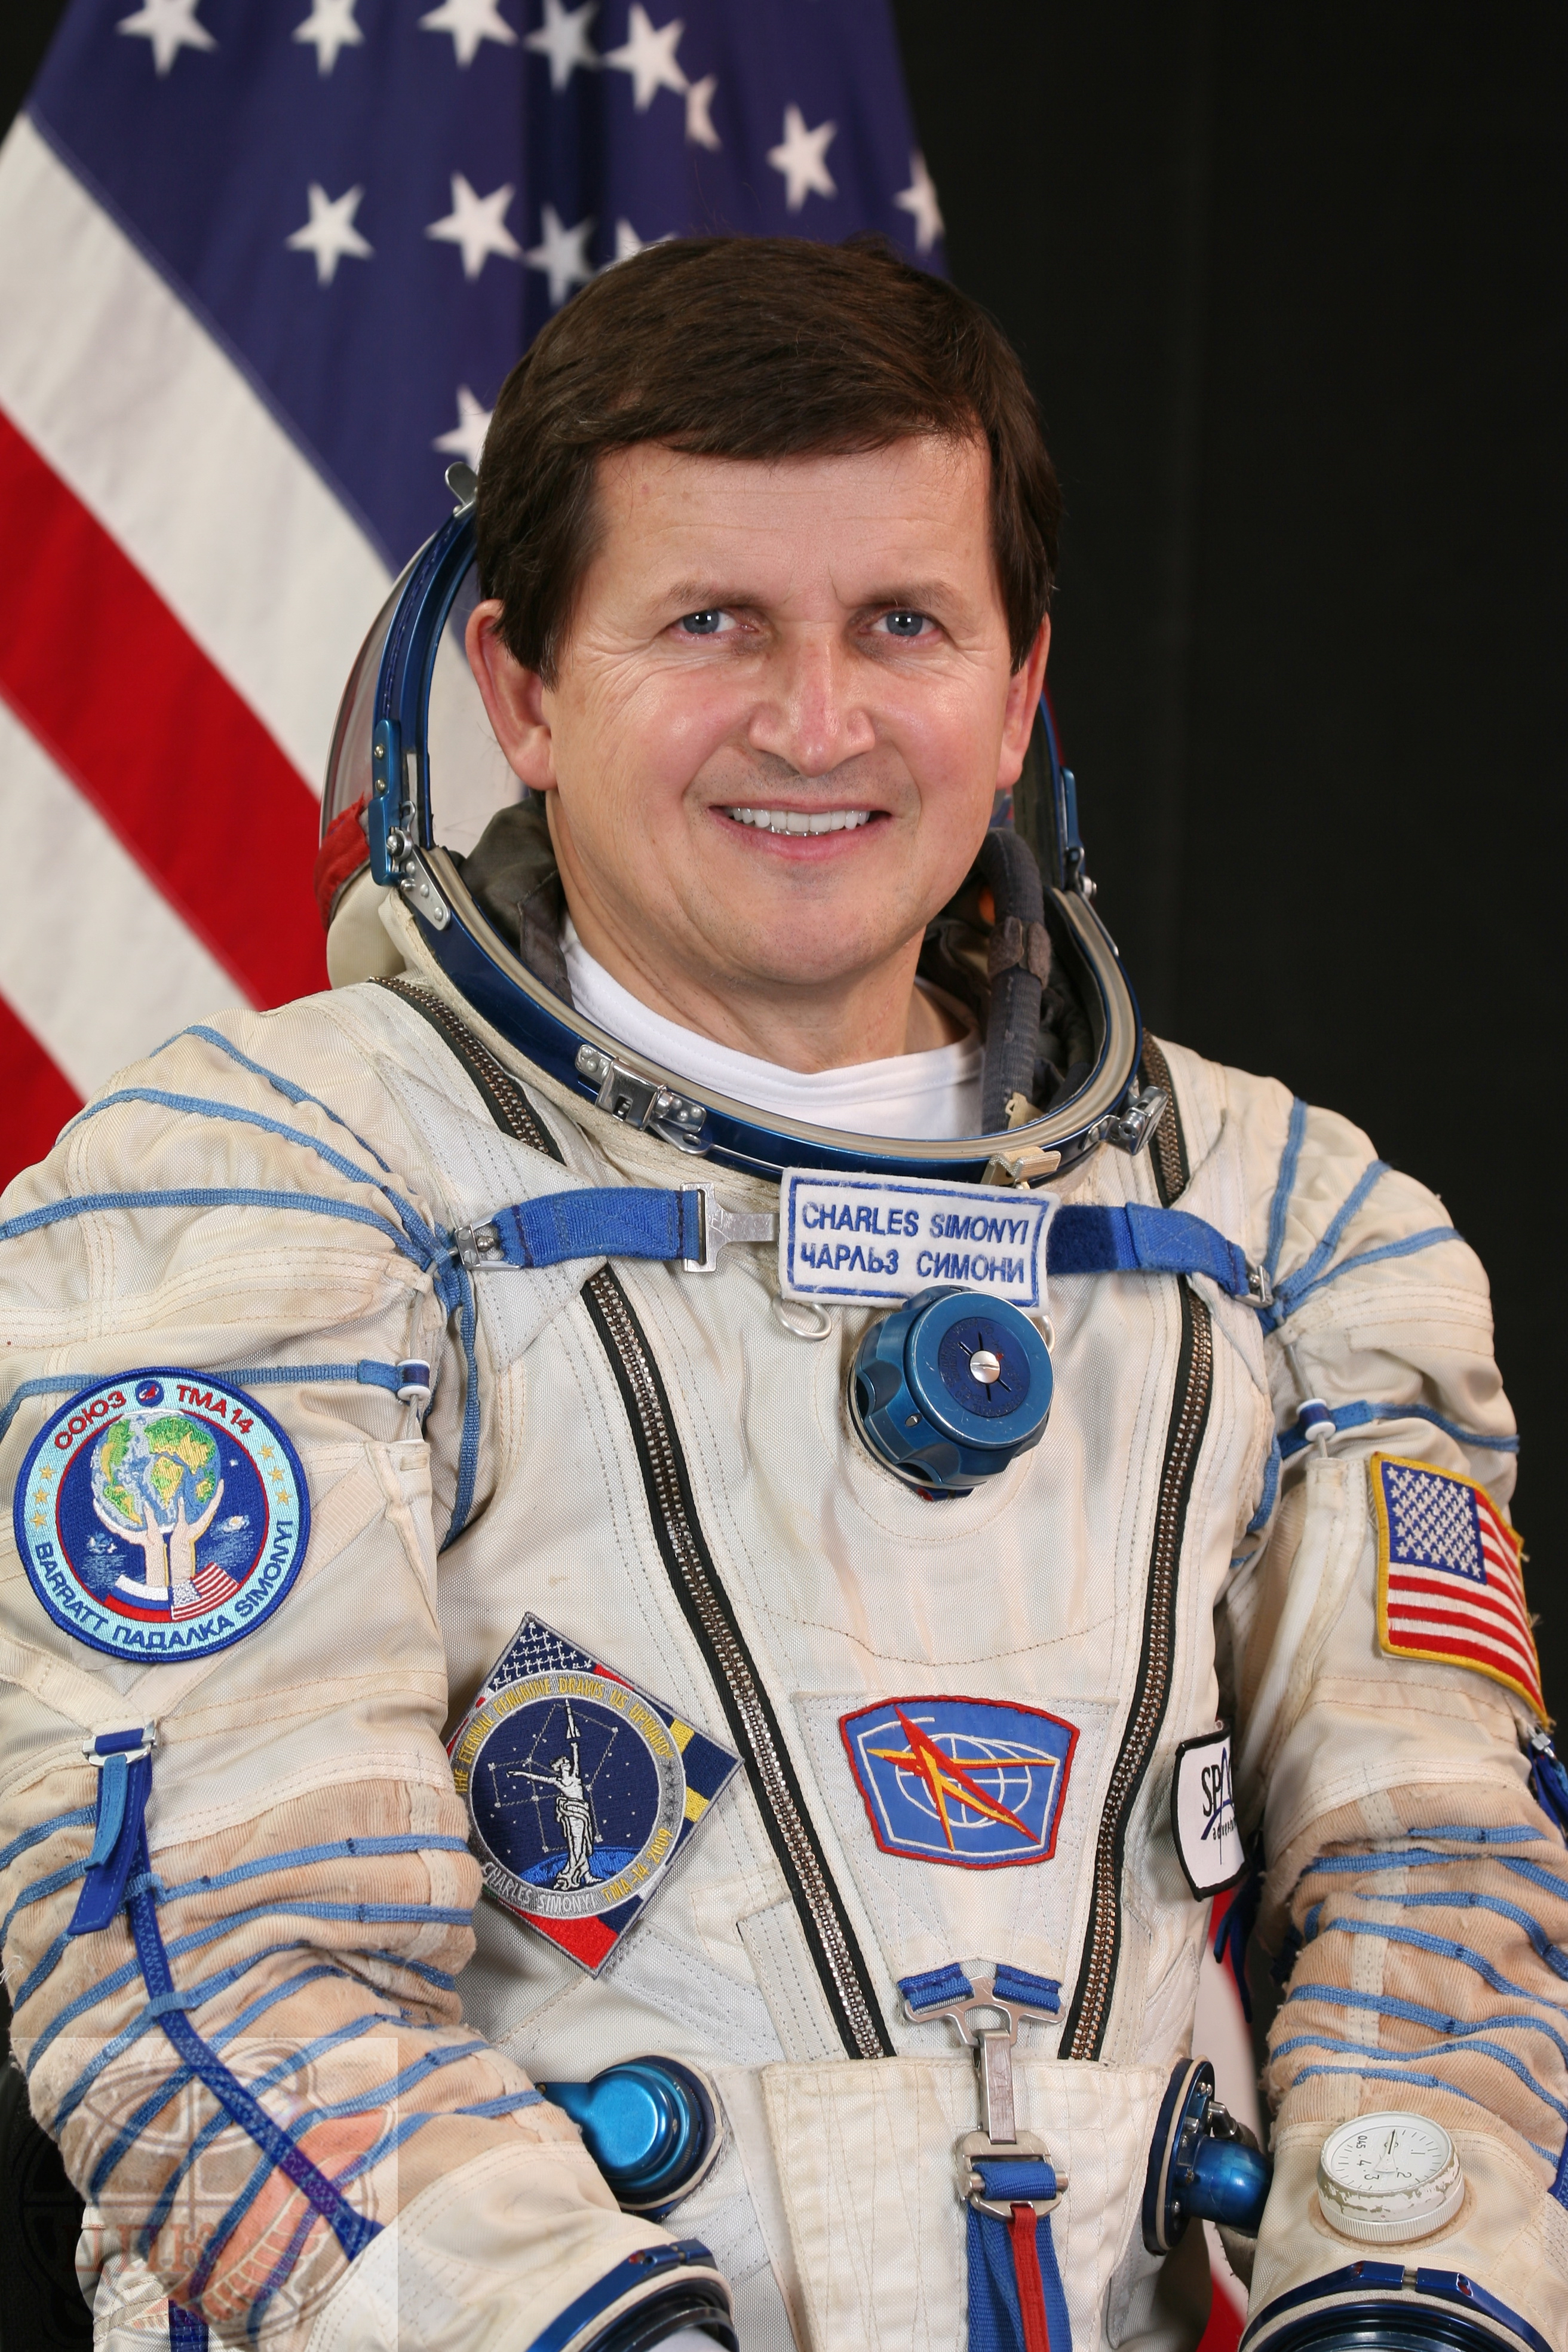 Charles Simonyi: Practicalities of Orbital Space Tourism - GeekWire